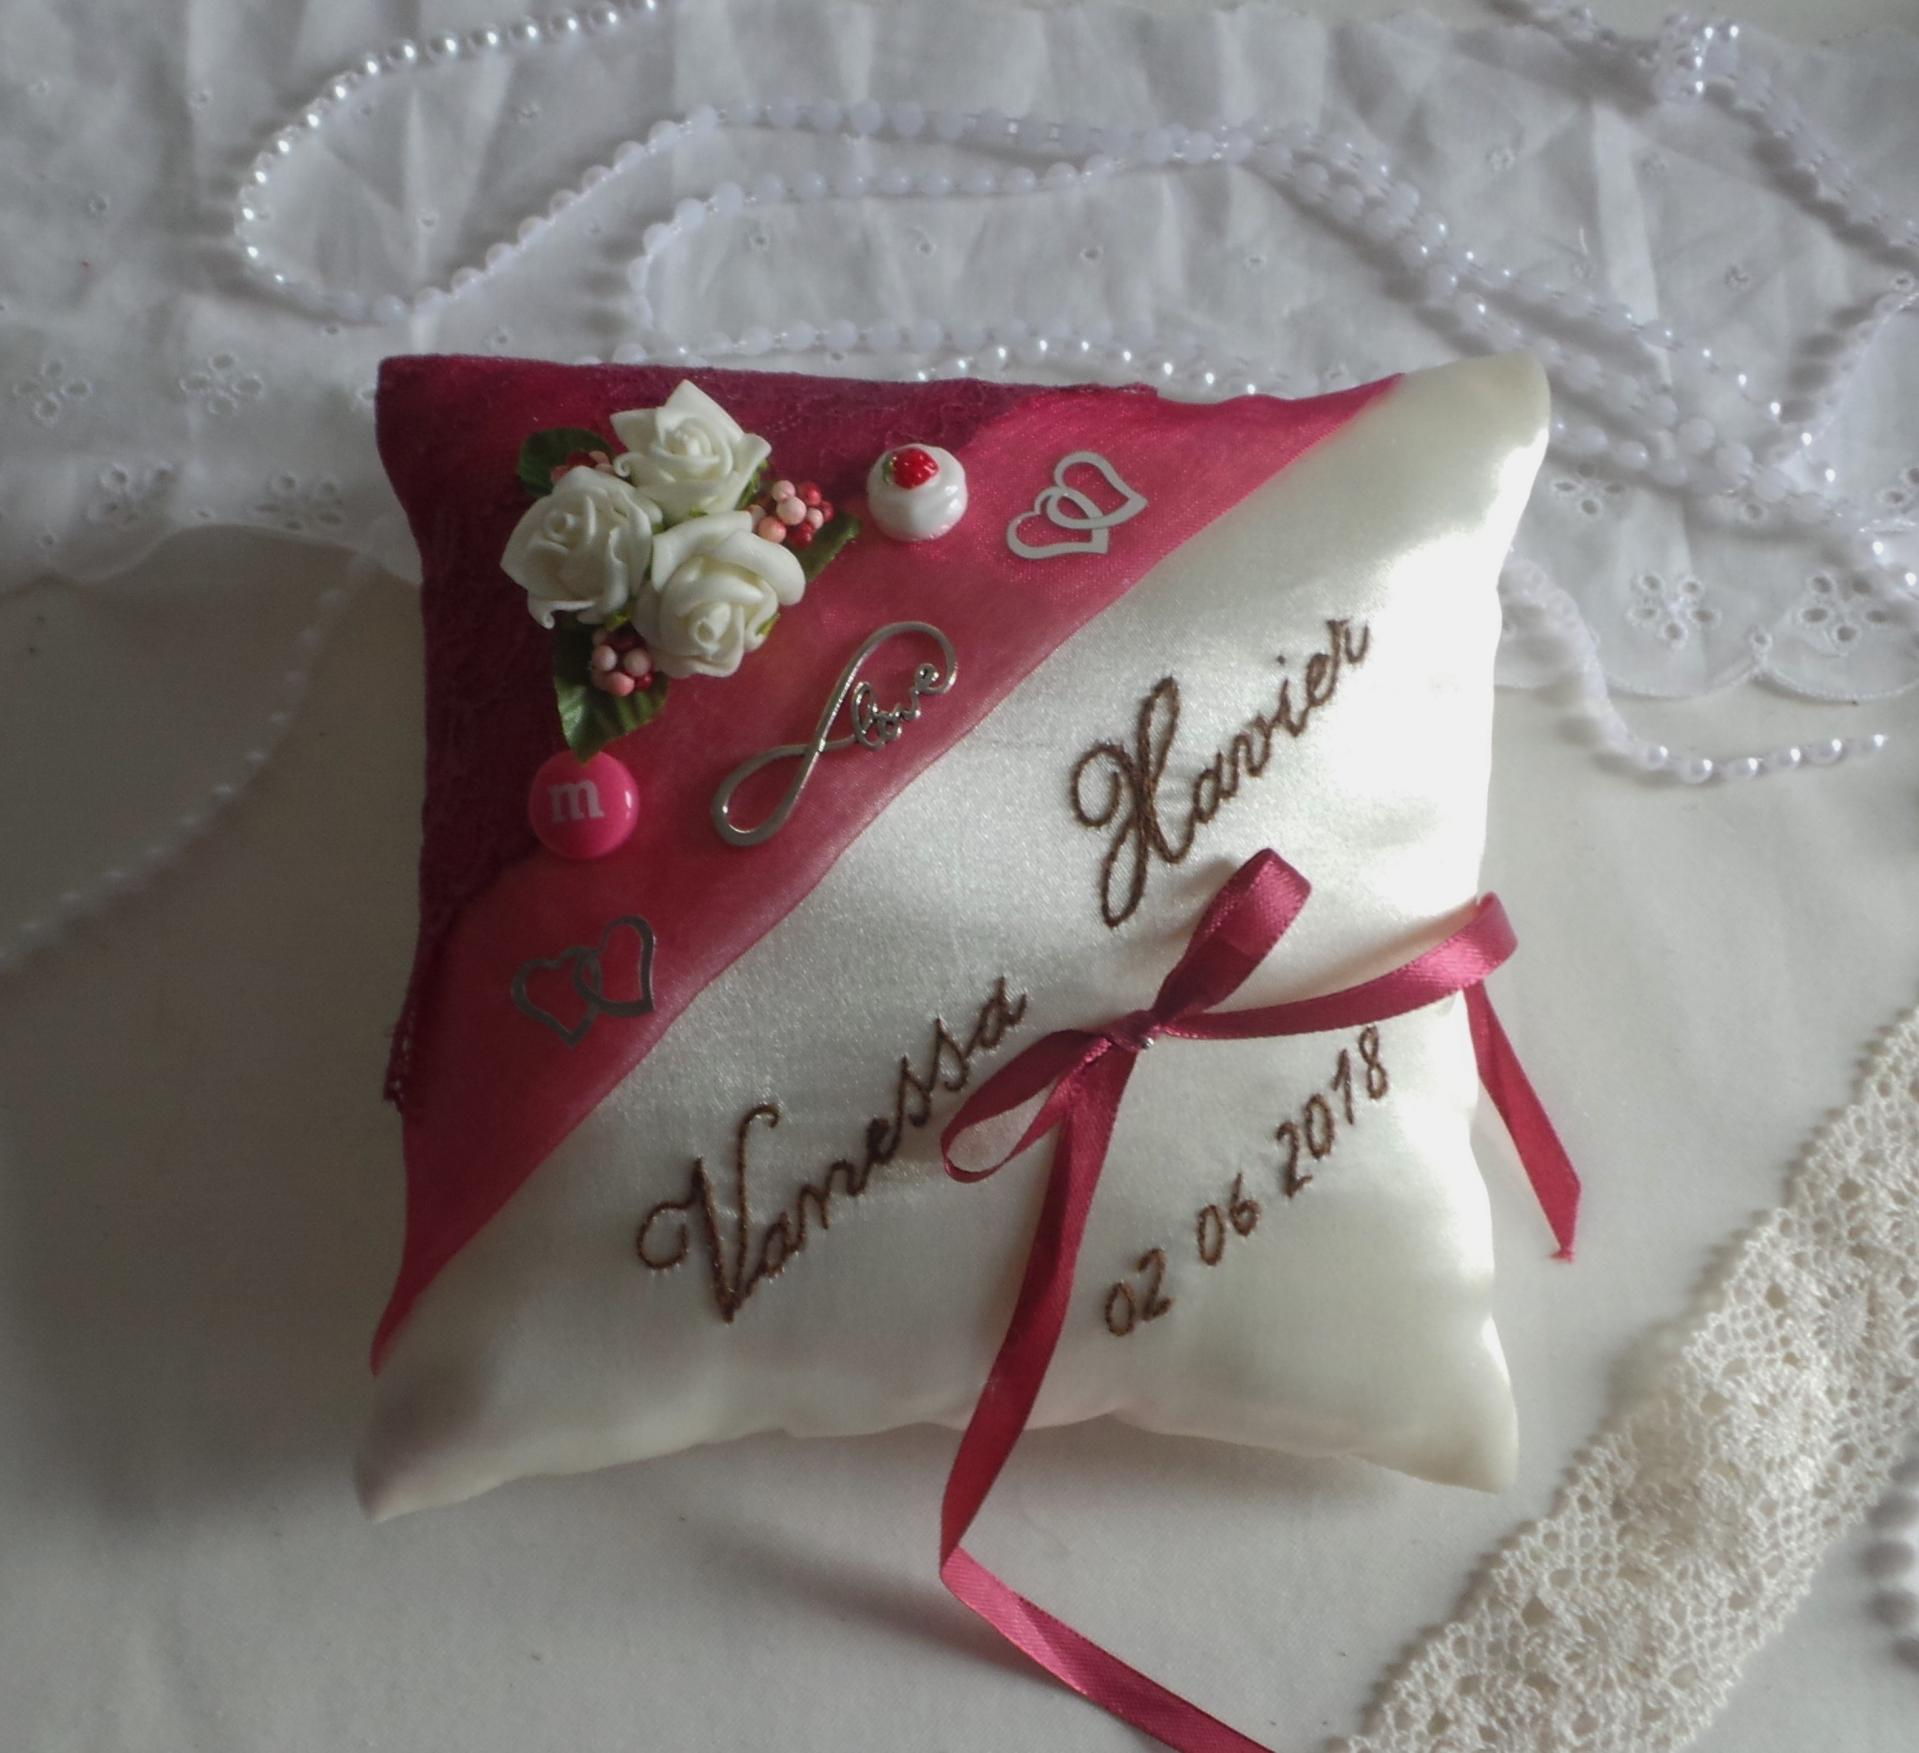 Coussin de mariage porte alliance gourmandise framboise chocolat